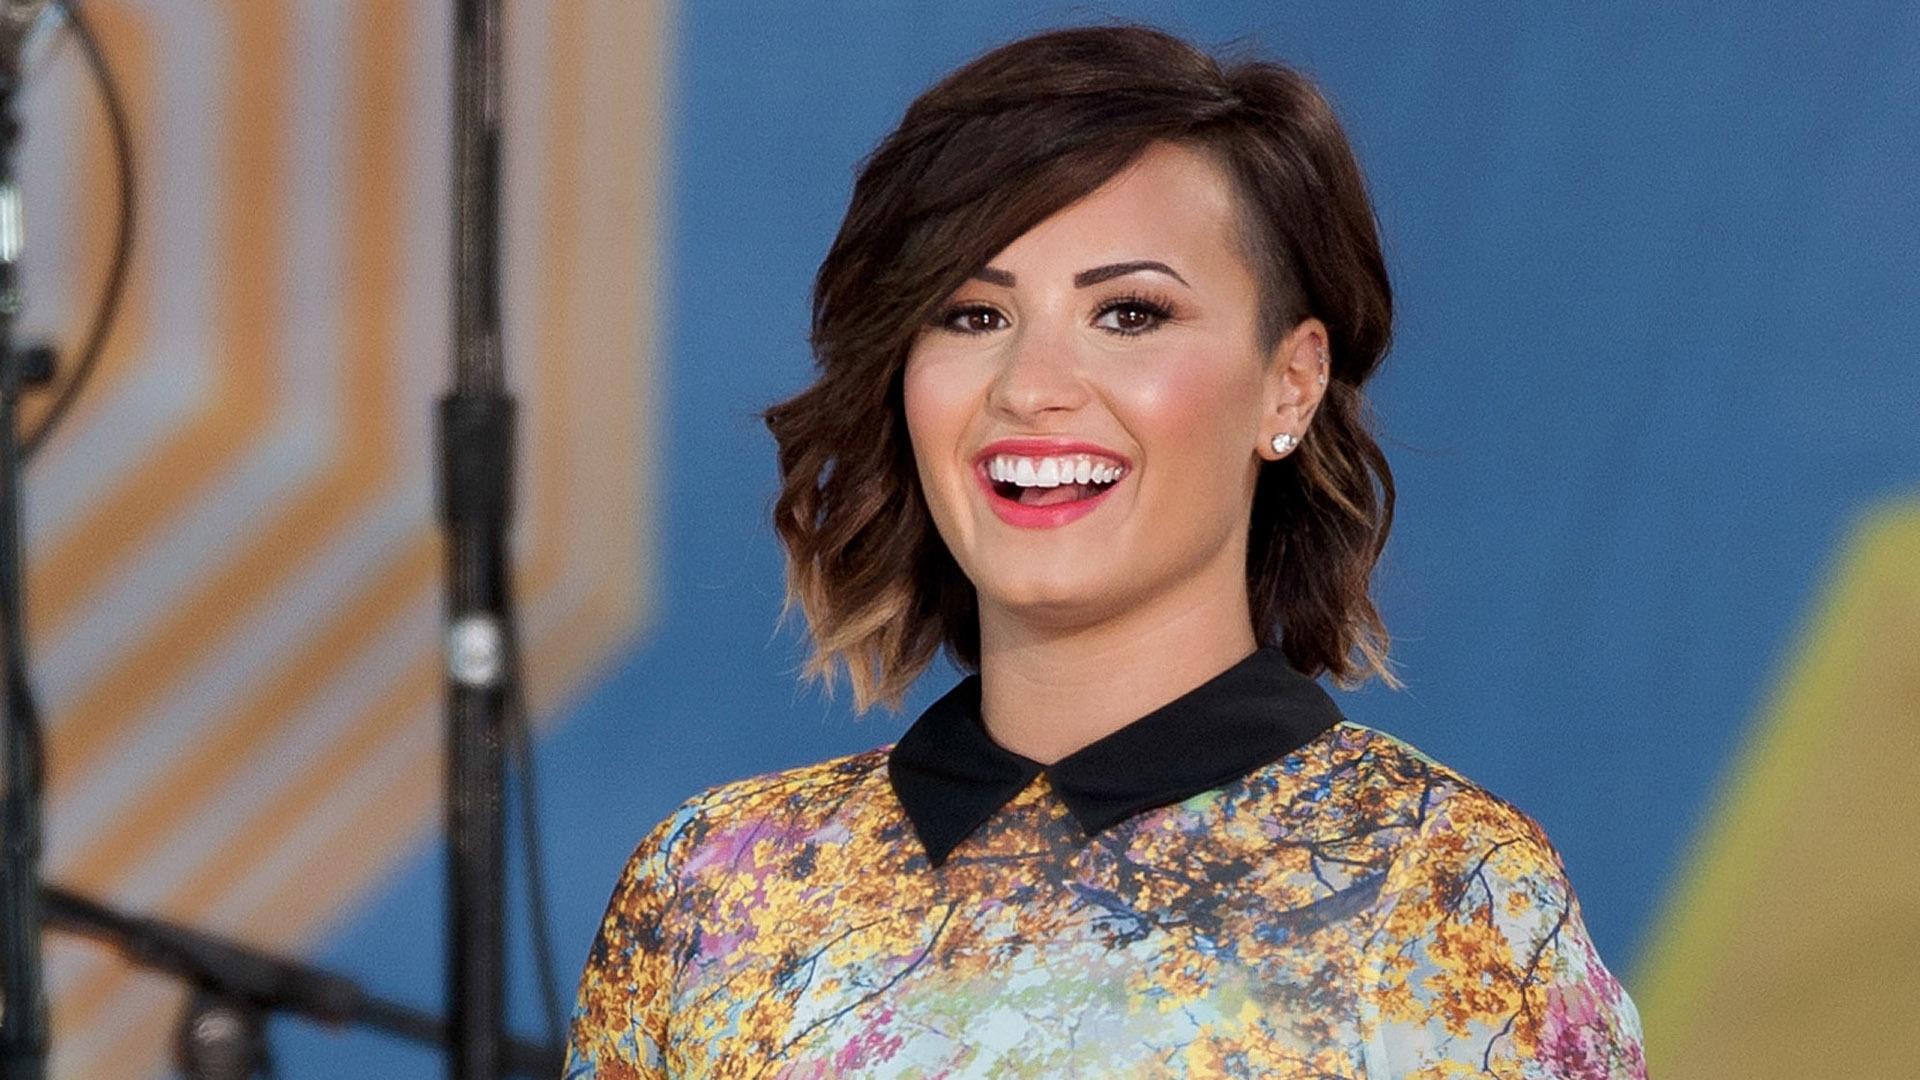 Demi Lovato Short Full Hd